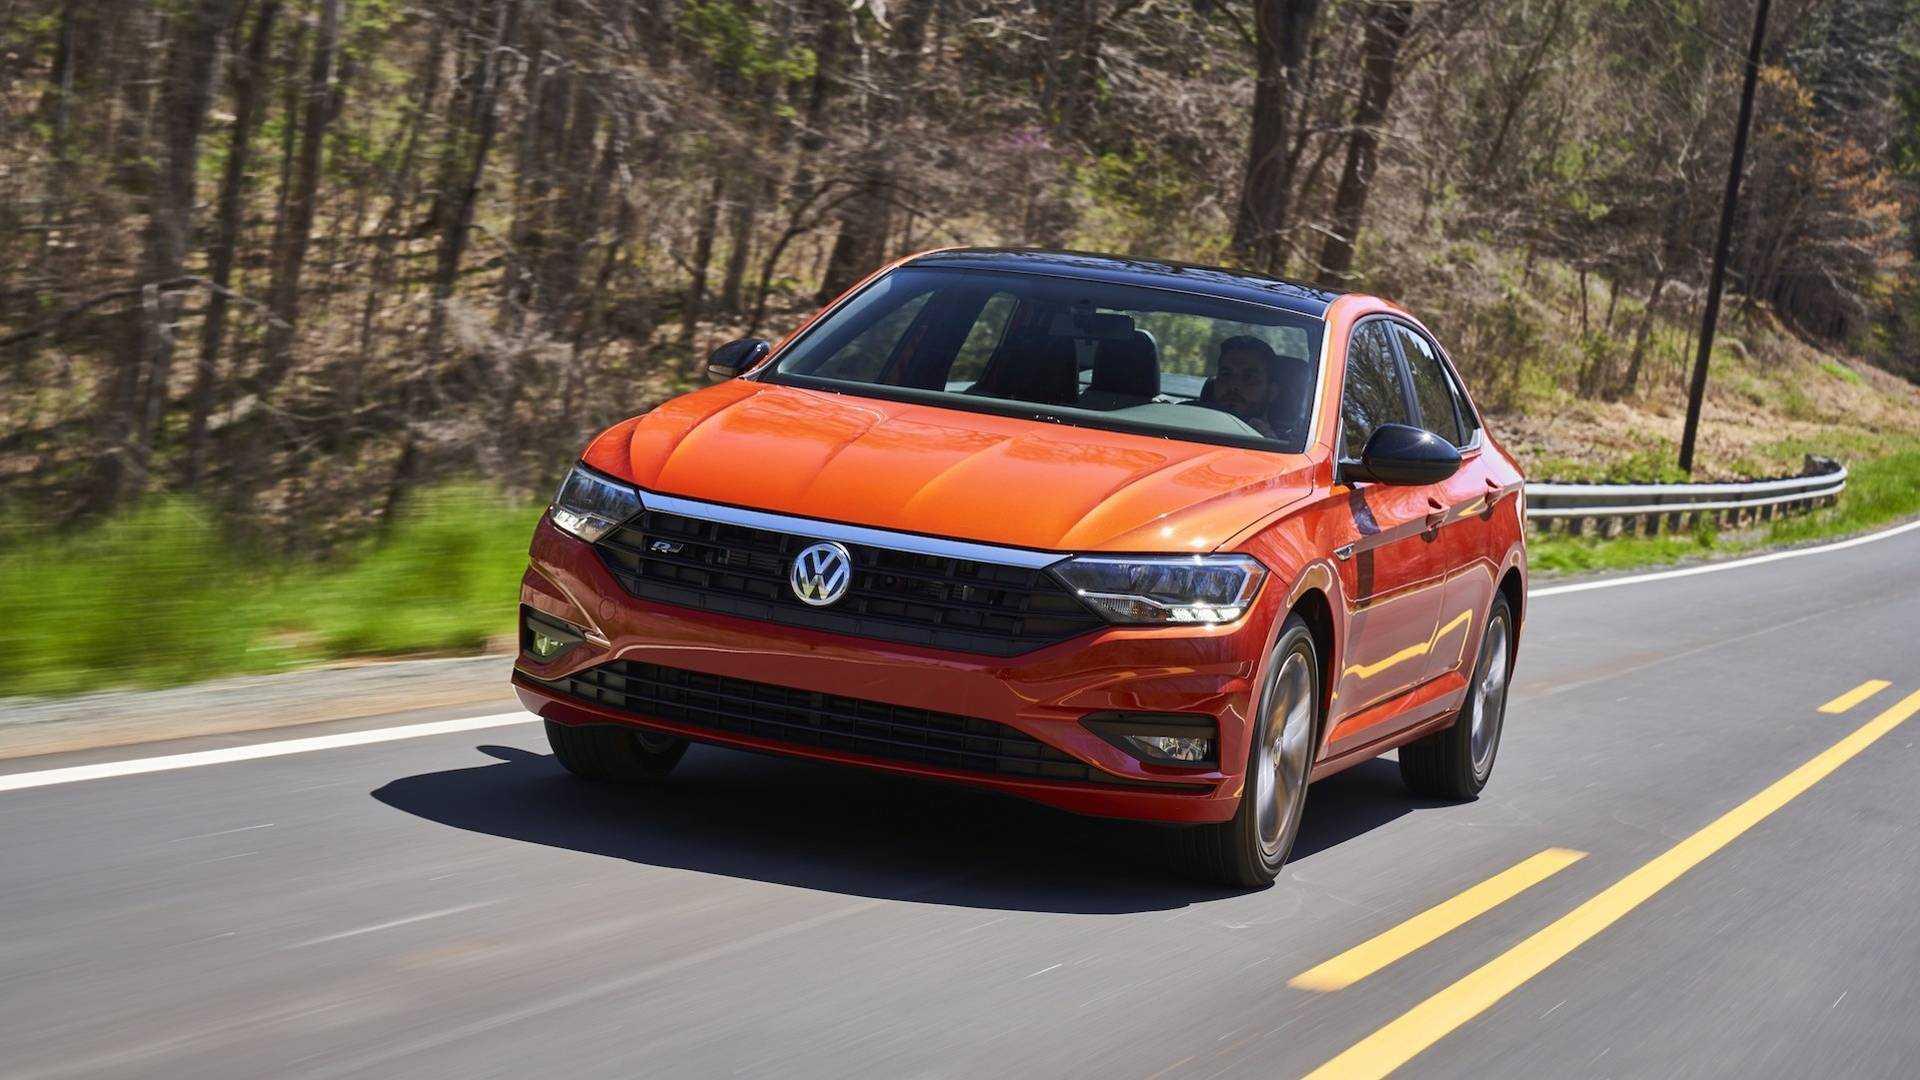 2019 Volkswagen Jetta Ilk Surus Buyumus Ve Gelismis